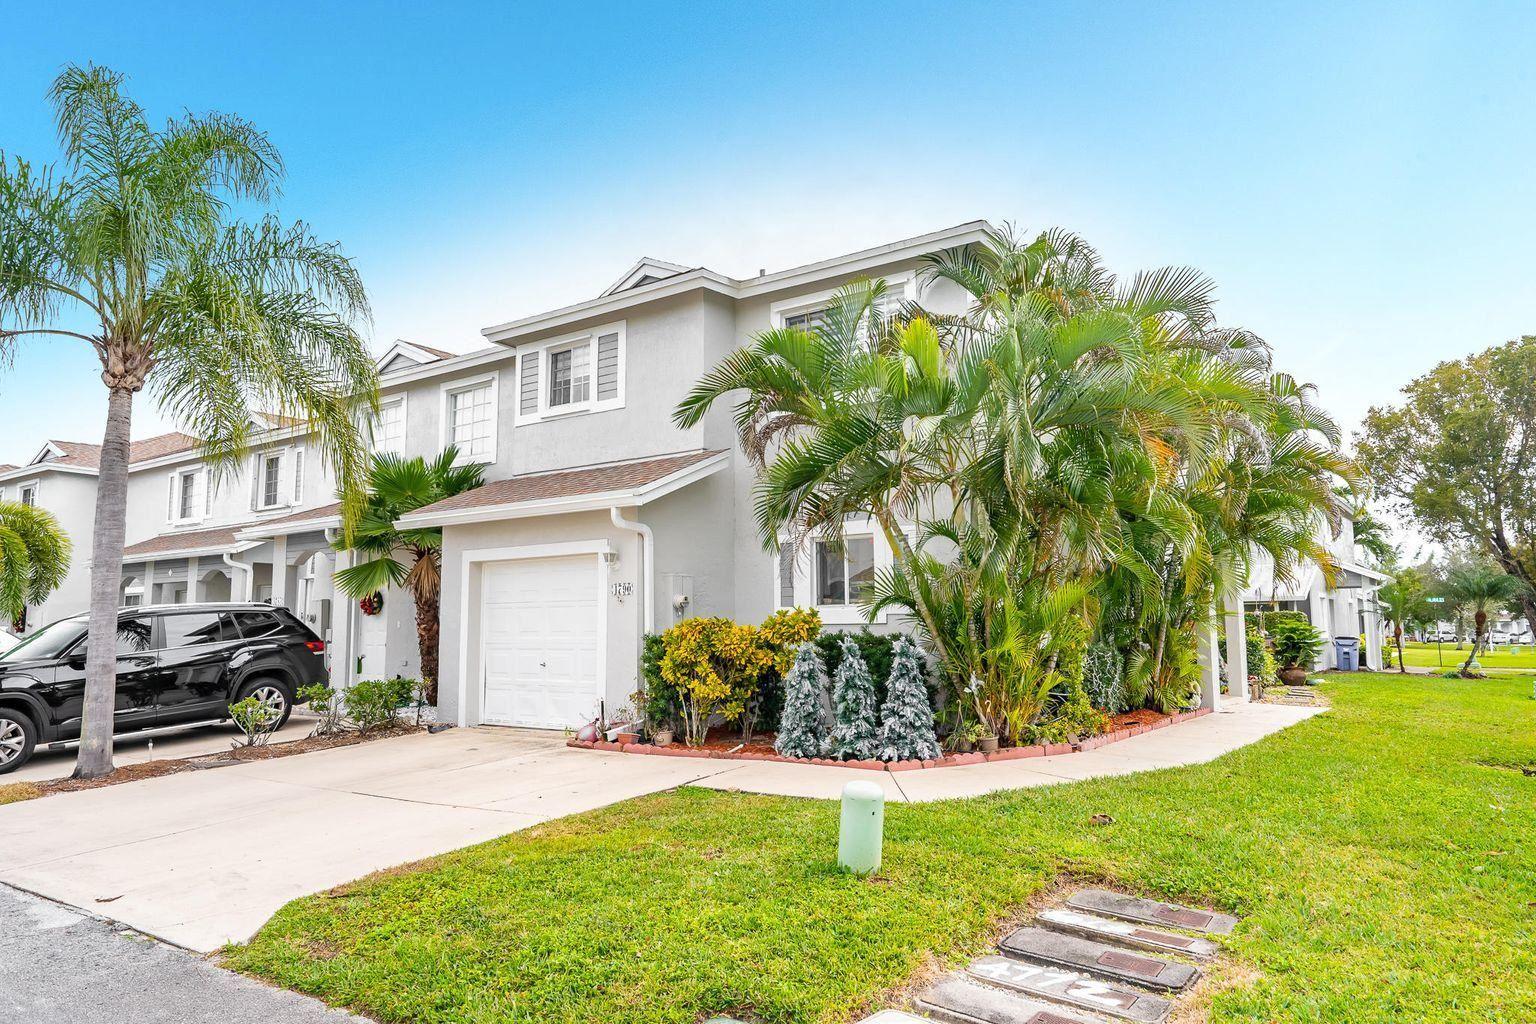 4790 SW 14th Street, Deerfield Beach, FL 33442 - #: RX-10707528